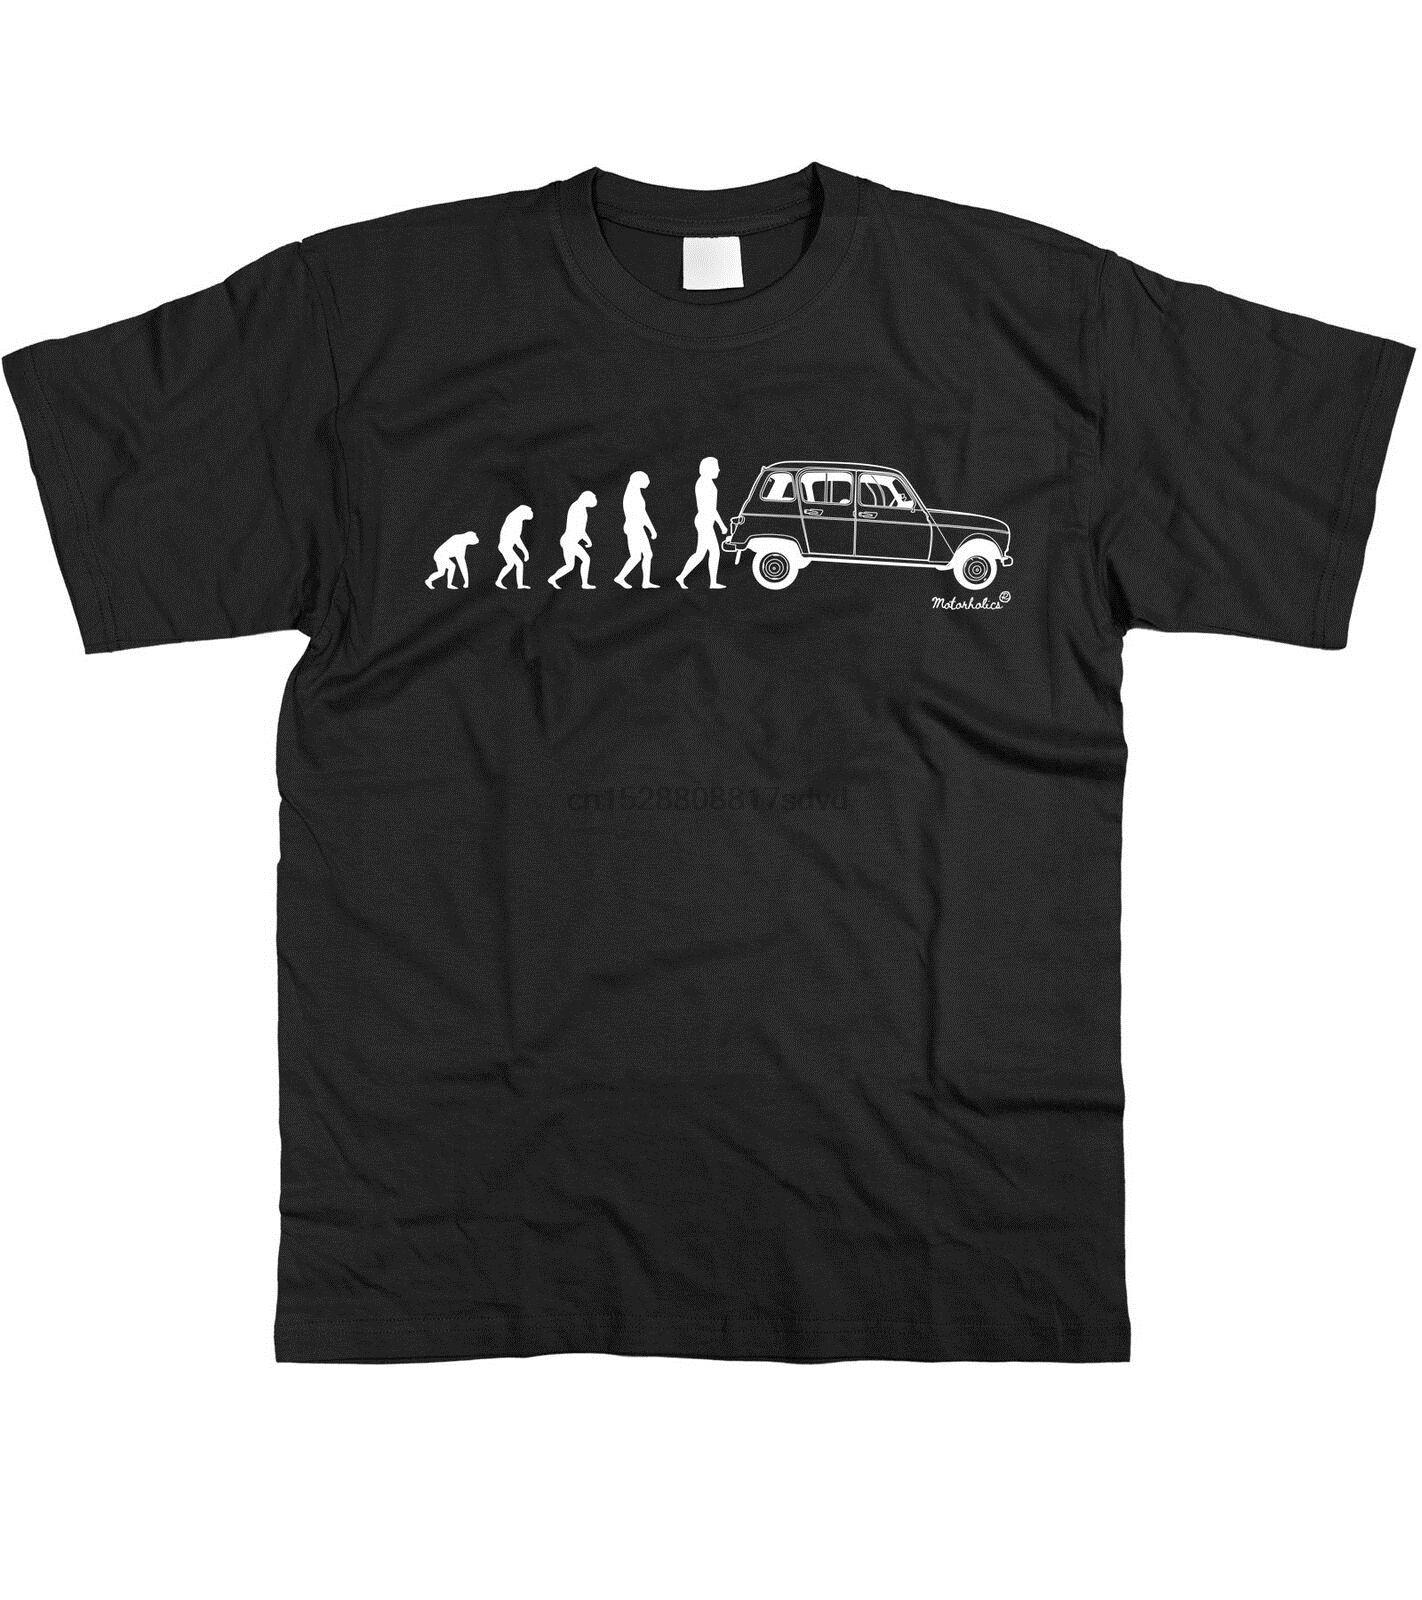 Motorholics Mens Evolution of Man a Renault 4 Classic Francese T-shirt S - a maniche corte 5XL Tee Shirt di trasporto a basso costo Wholesa